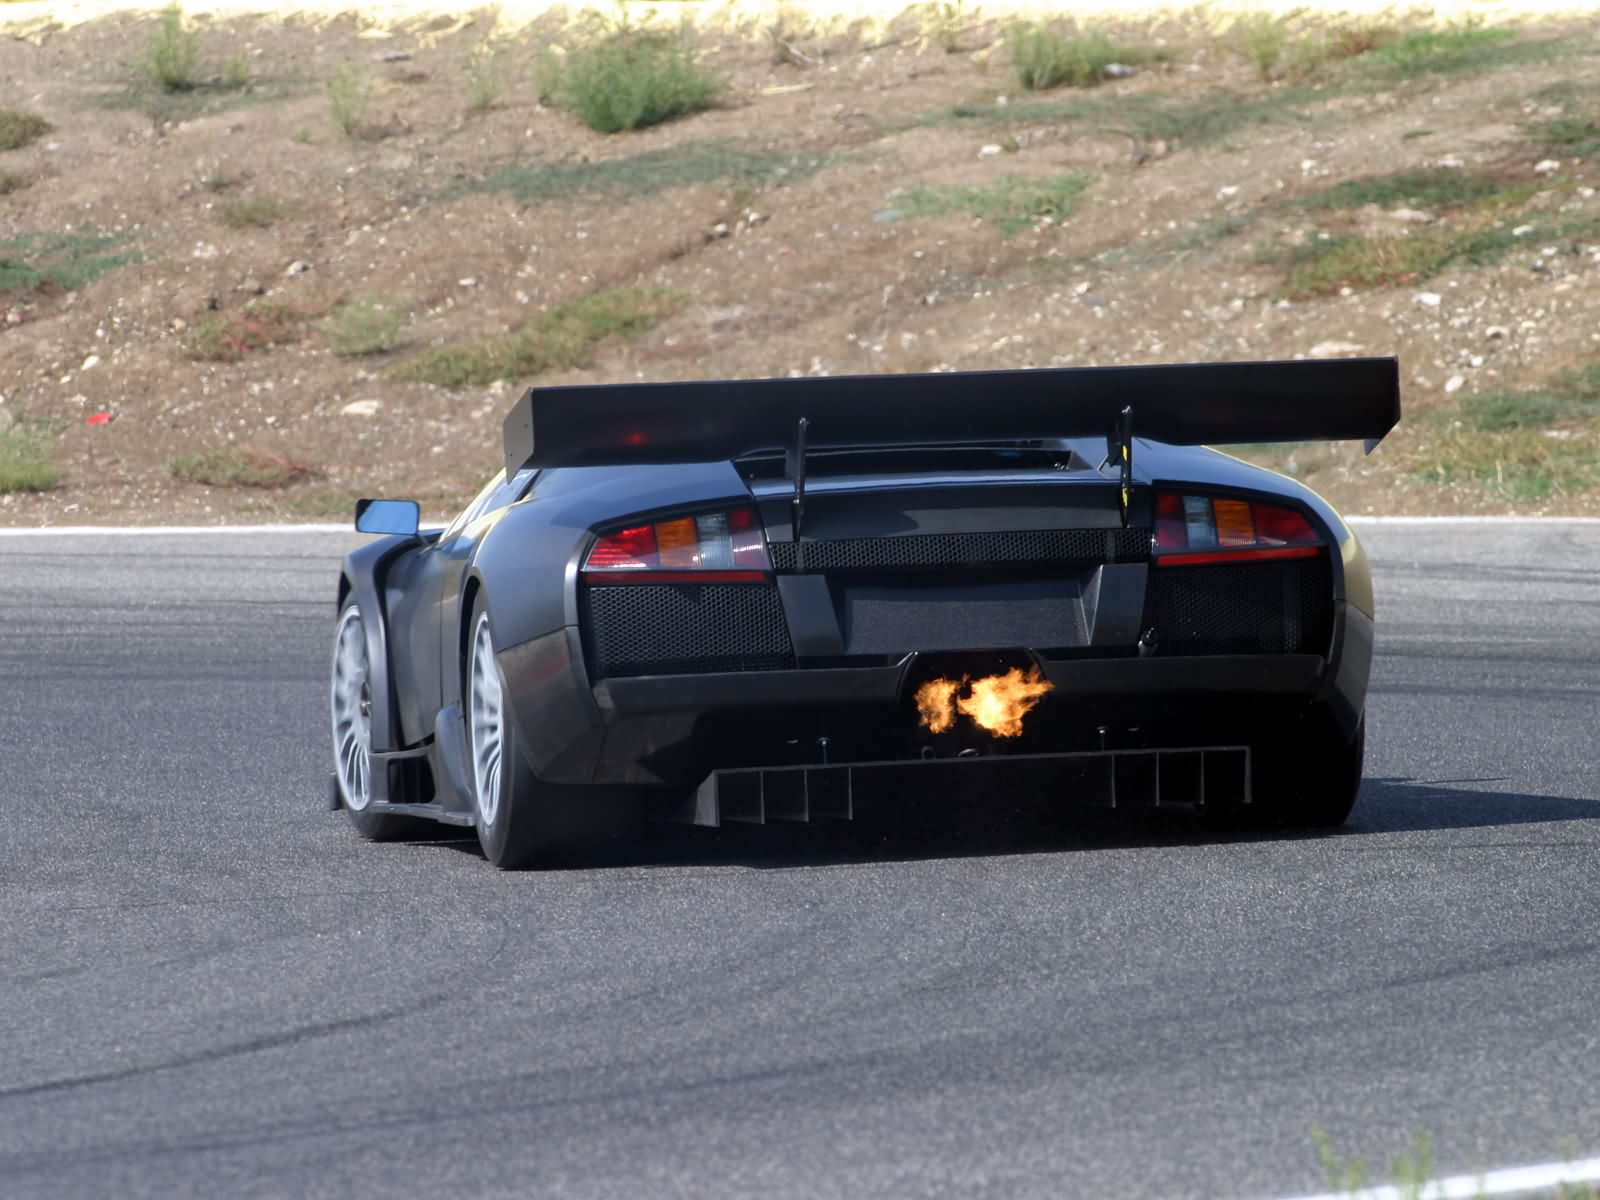 Lamborghini Murcielago R Gt Picture 16172 Lamborghini Photo